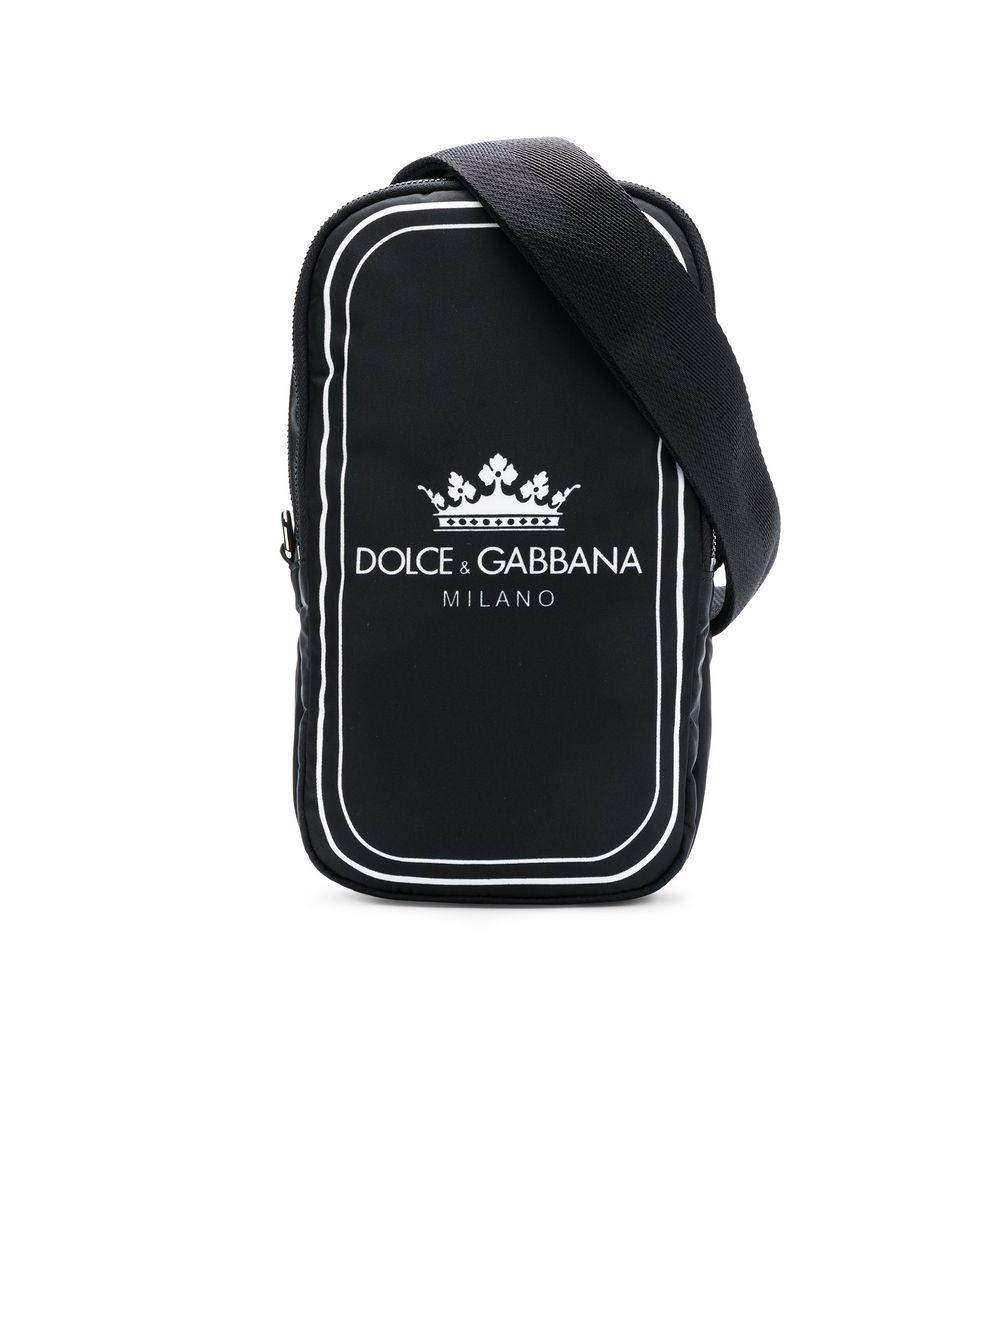 bf0025c8e8 Dolce & Gabbana. Men's Black And White Crown Logo Print Cross-body Bag